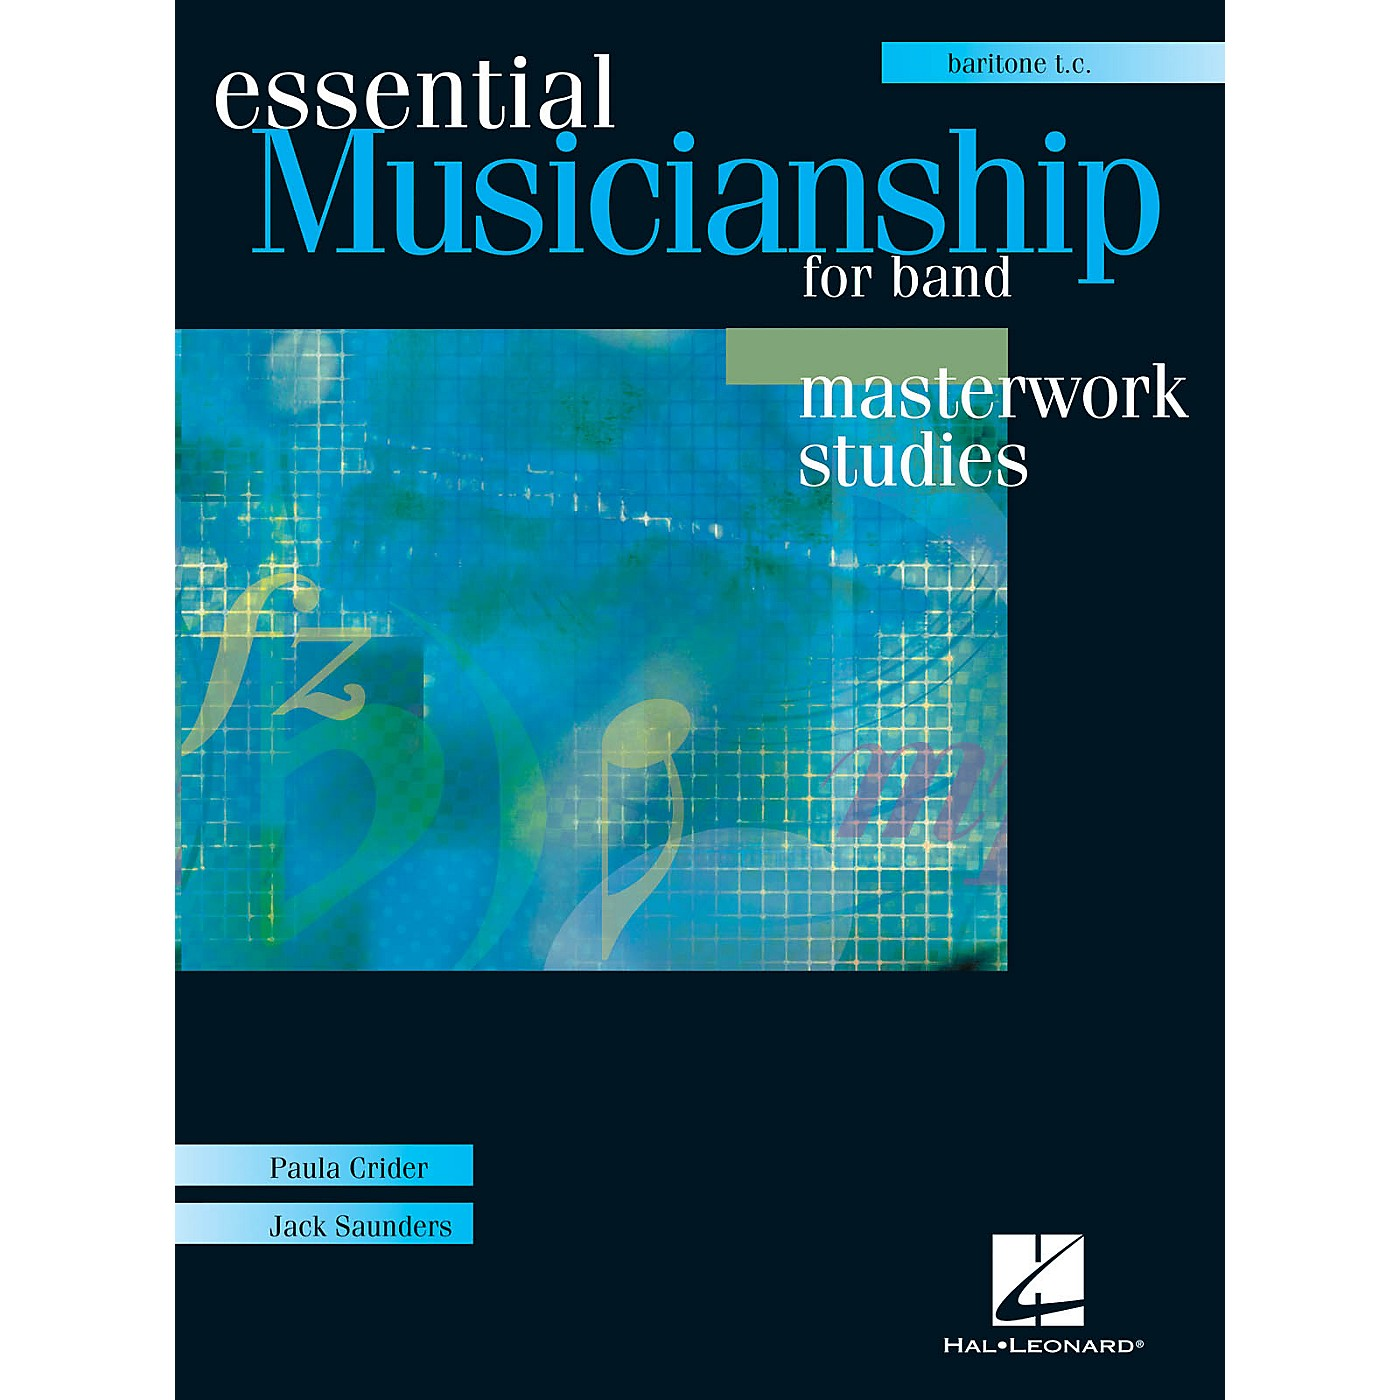 Hal Leonard Essential Musicianship for Band - Masterwork Studies (Baritone T.C.) Concert Band thumbnail